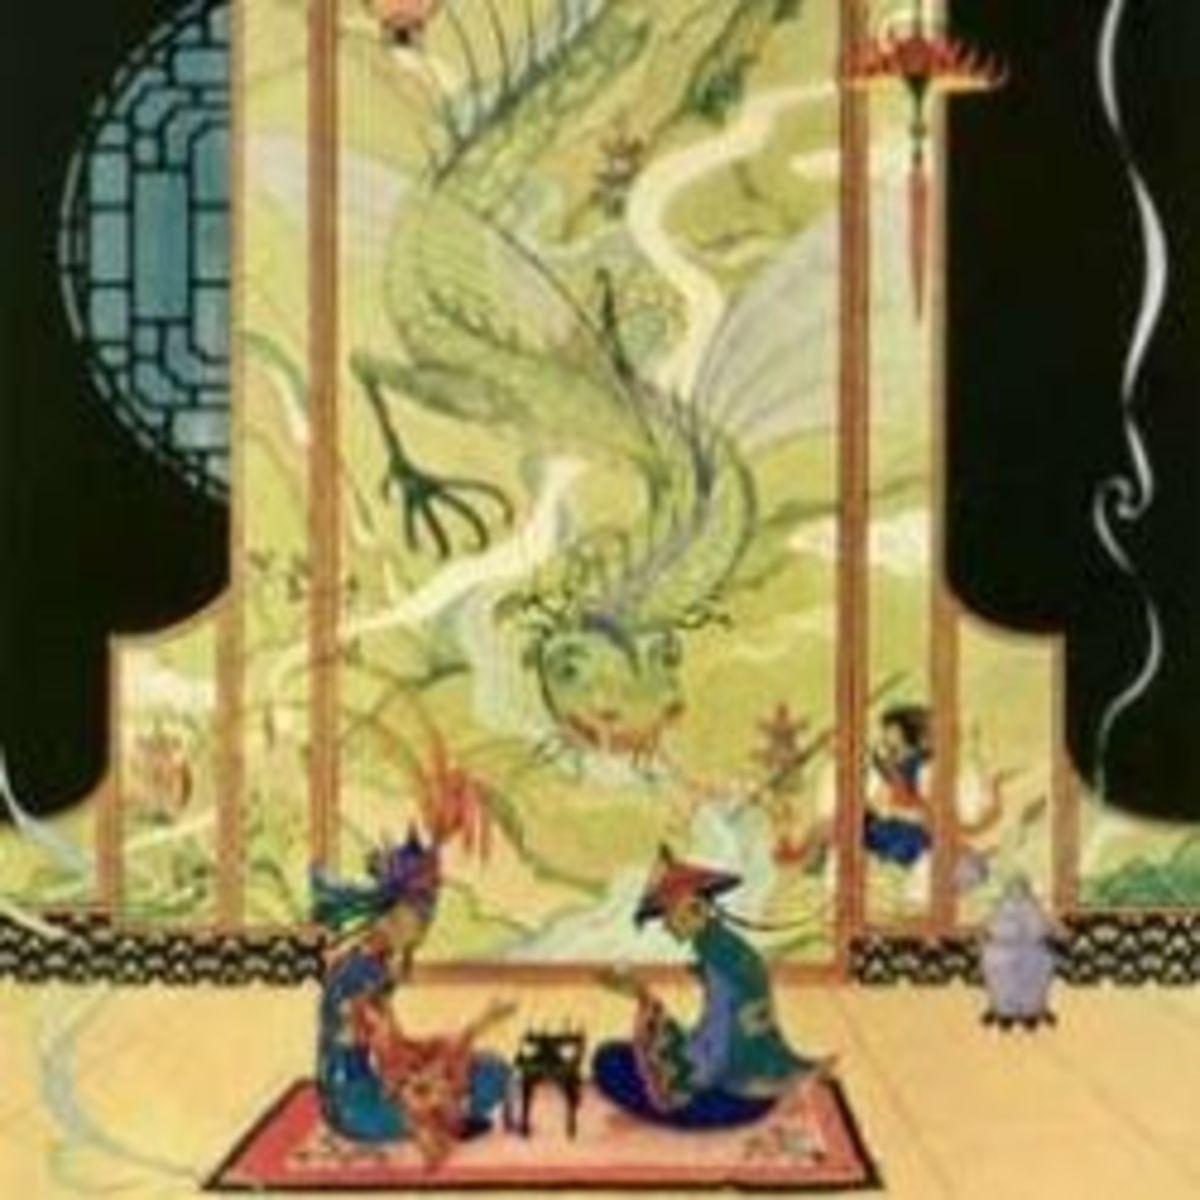 The stories of Arabian Nights (1001 Nights)